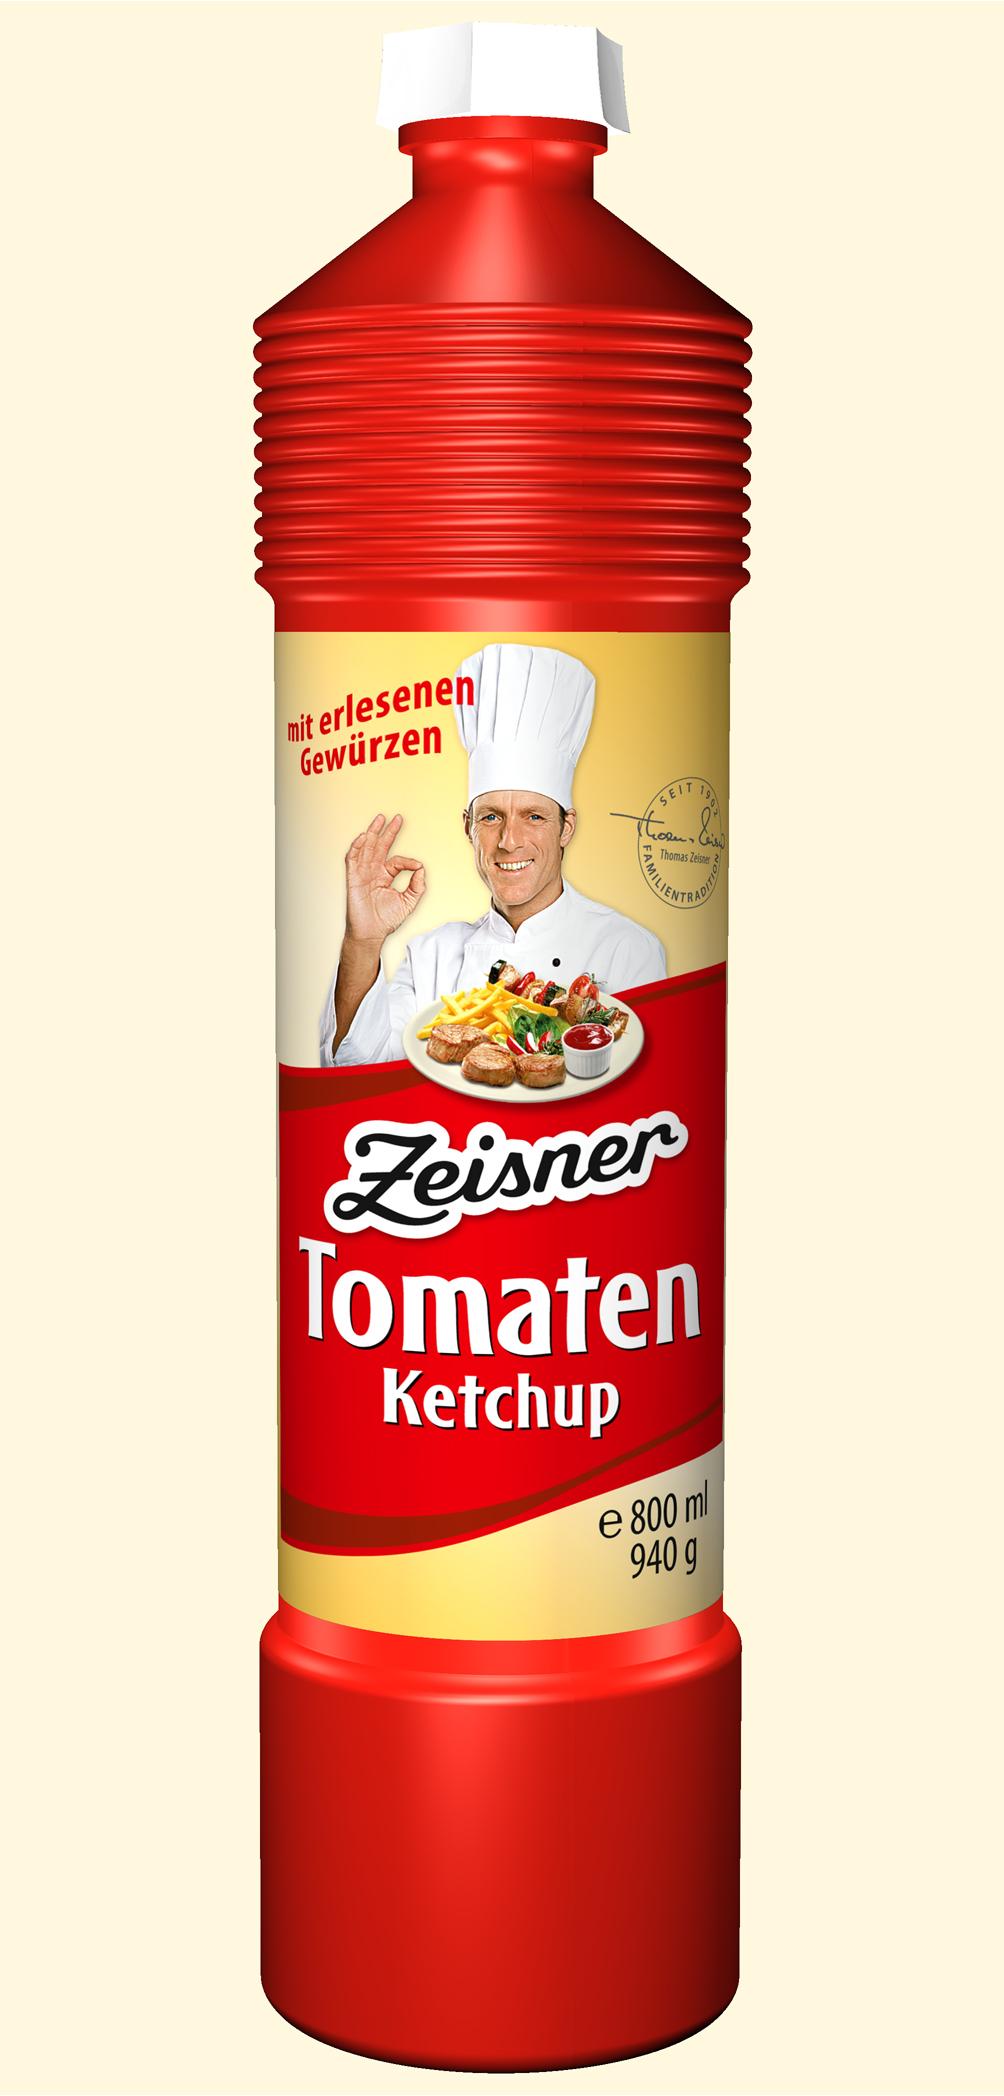 Zeisner Tomaten-Ketchup 800ml Flasche